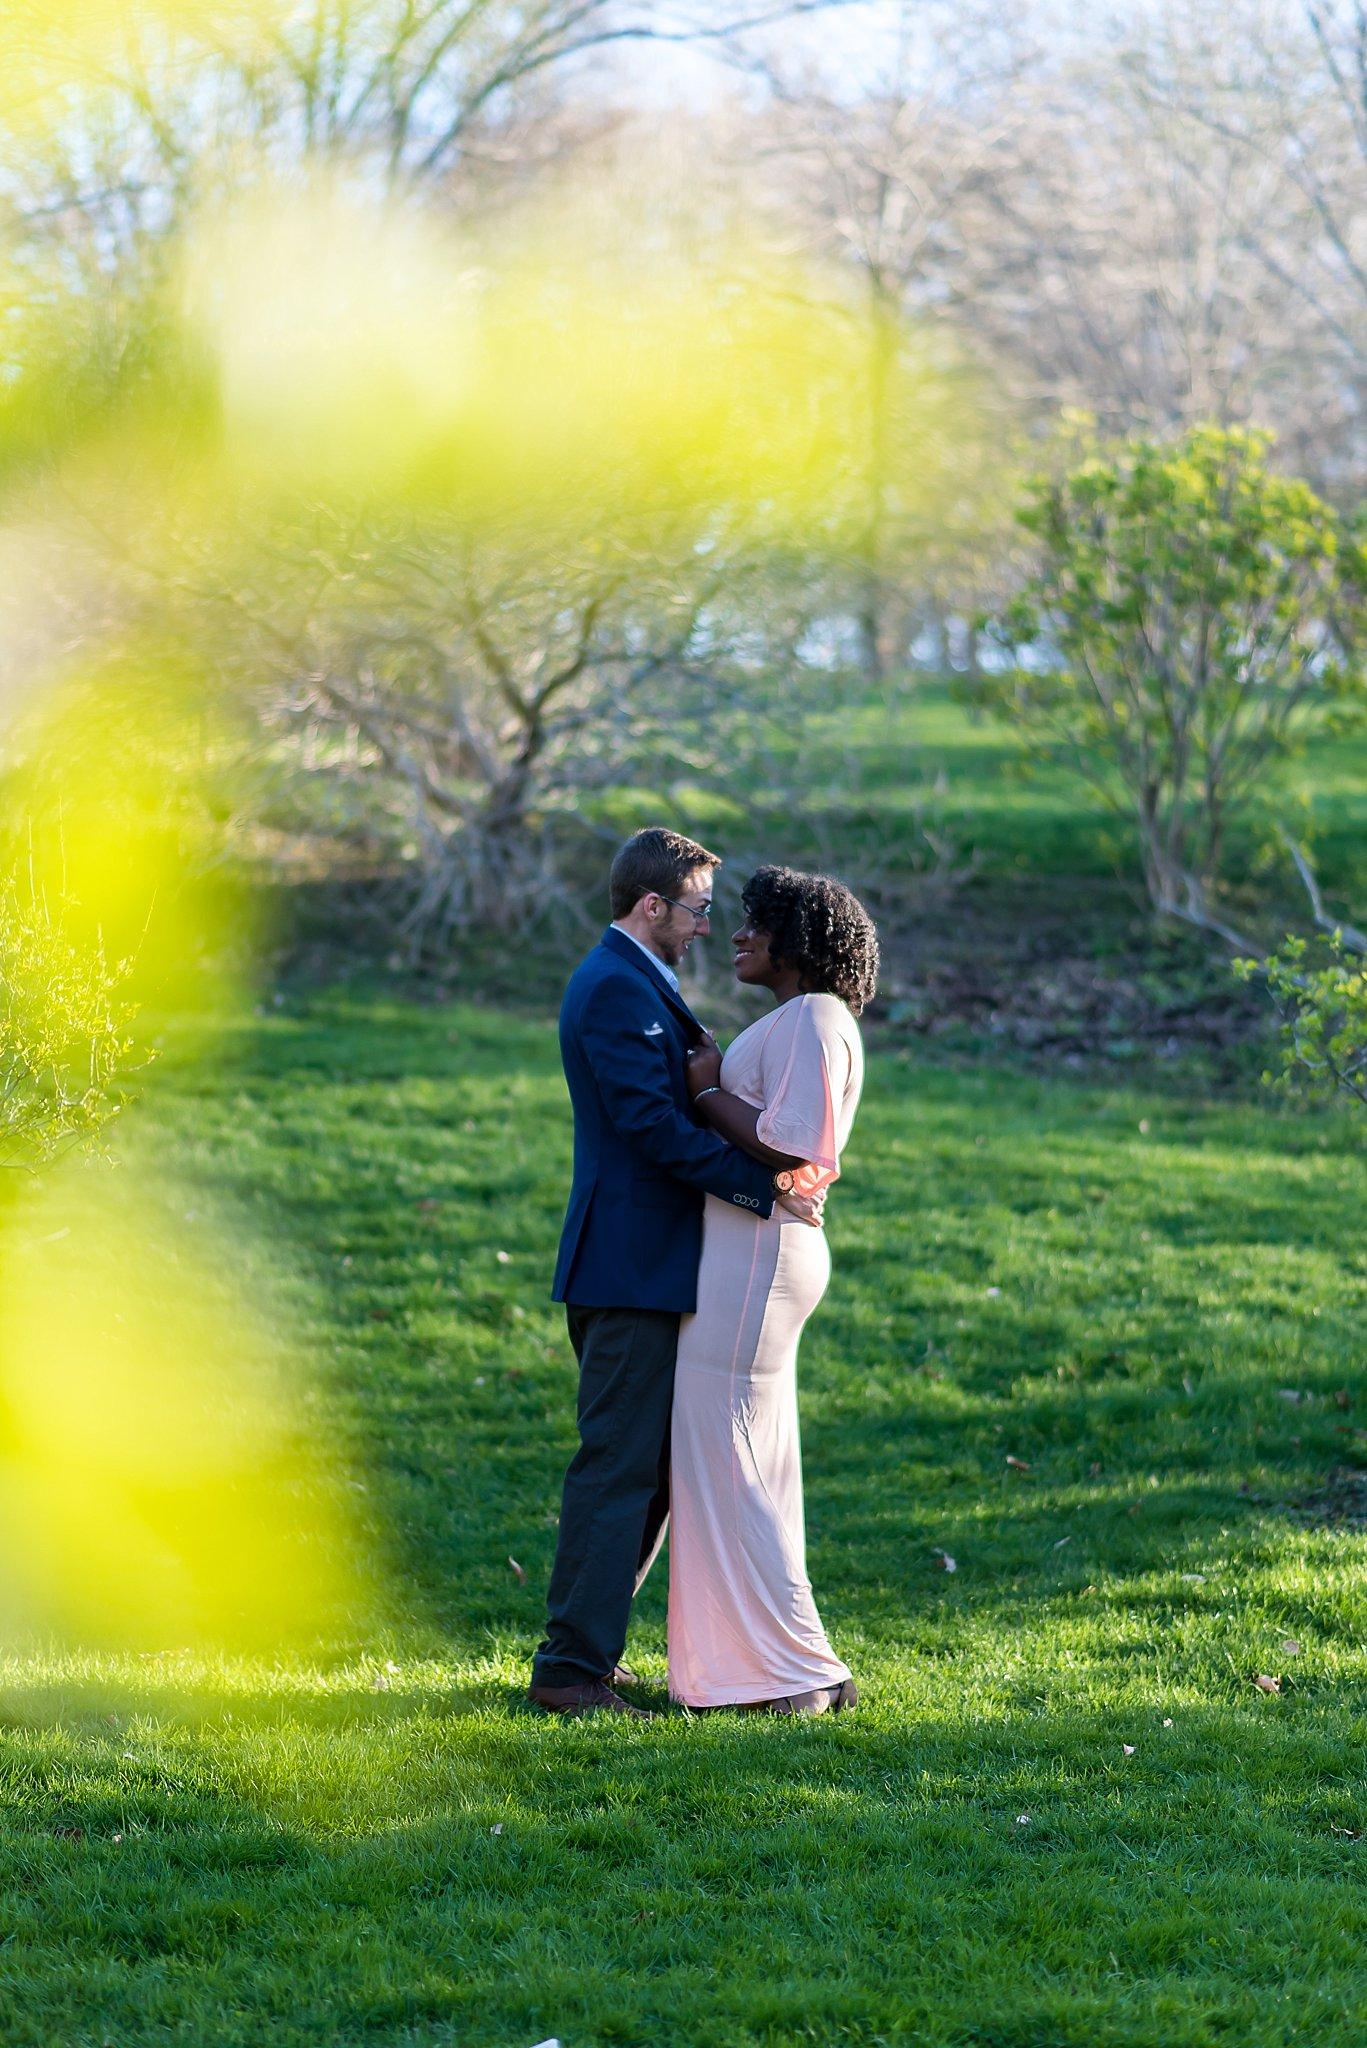 Engagement Photography in Boston 4.jpg